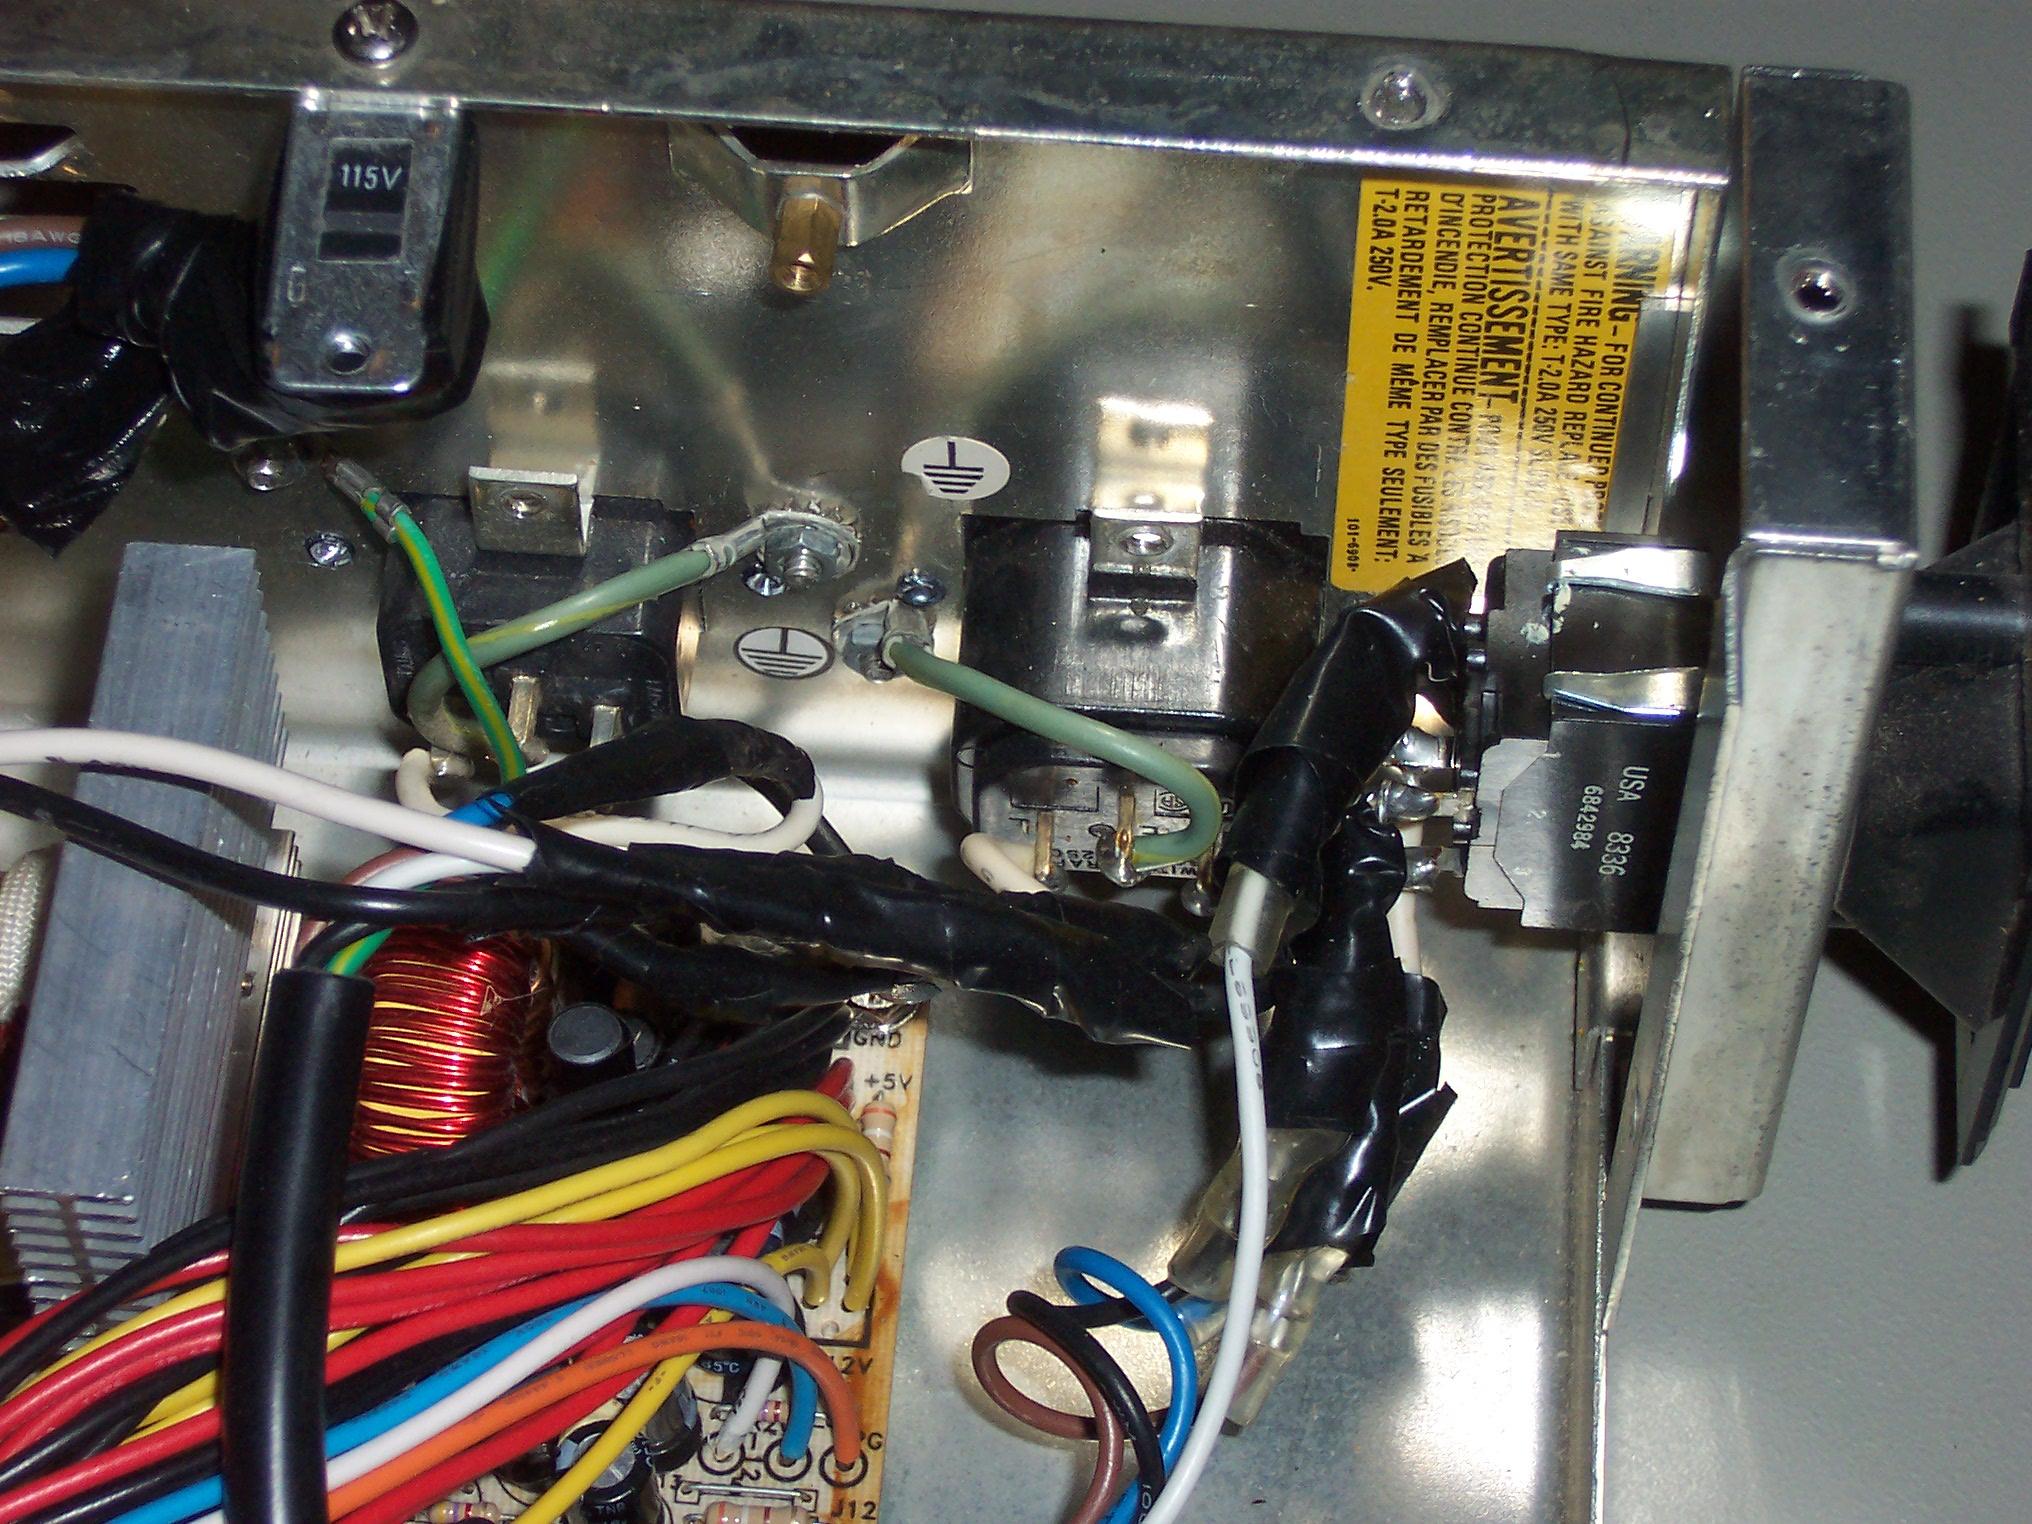 5150 Power Supply Repair [Archive] - Vintage Computer Forum